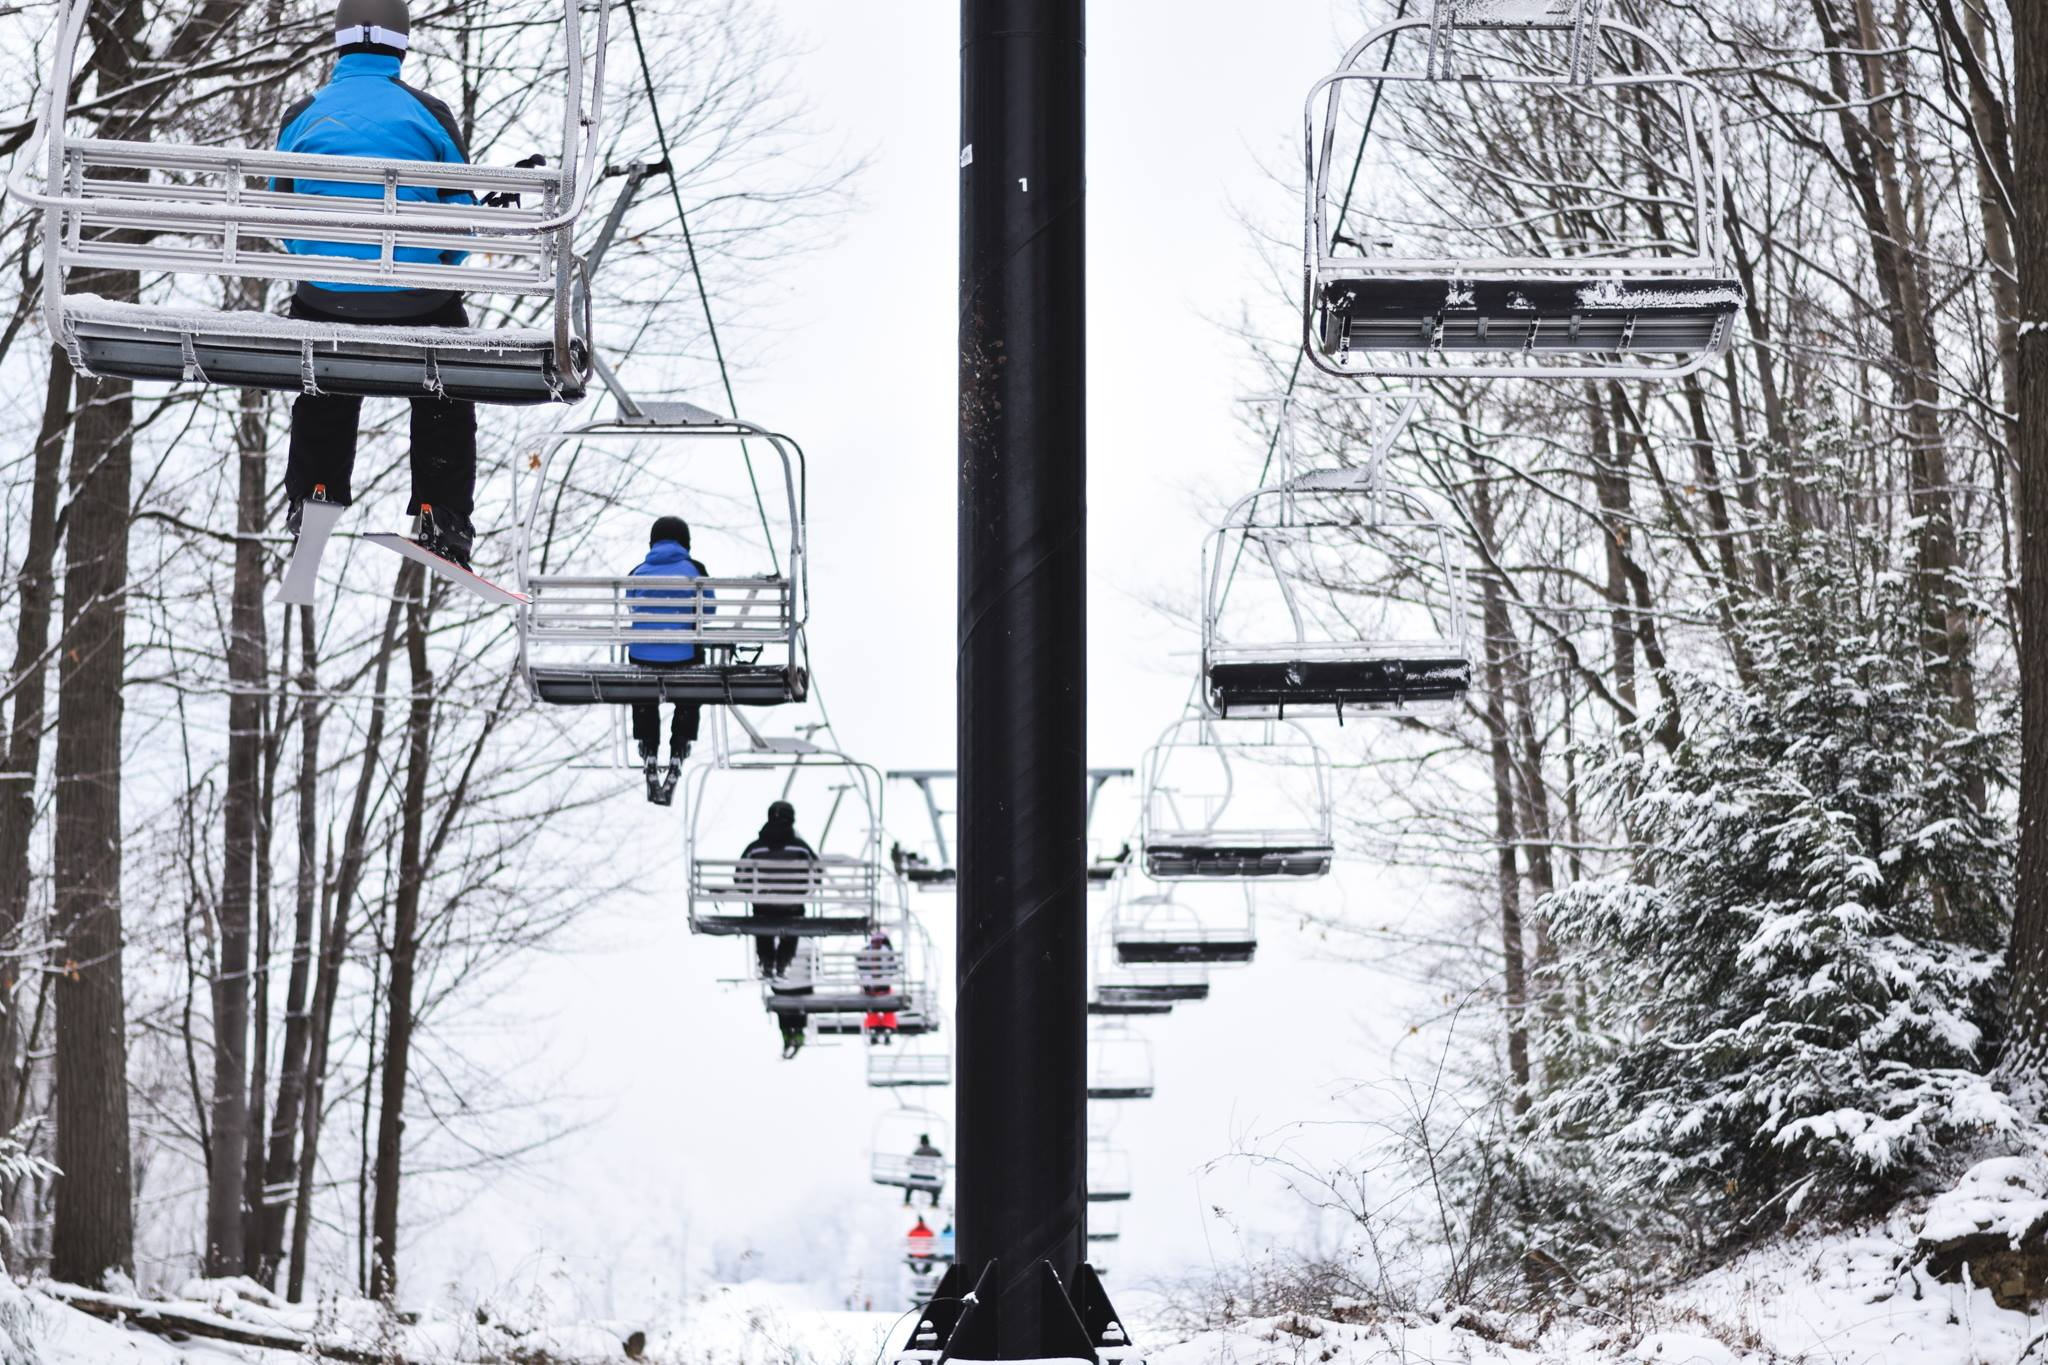 nepa ski resort   pennsylvania   contact us   montage mountain